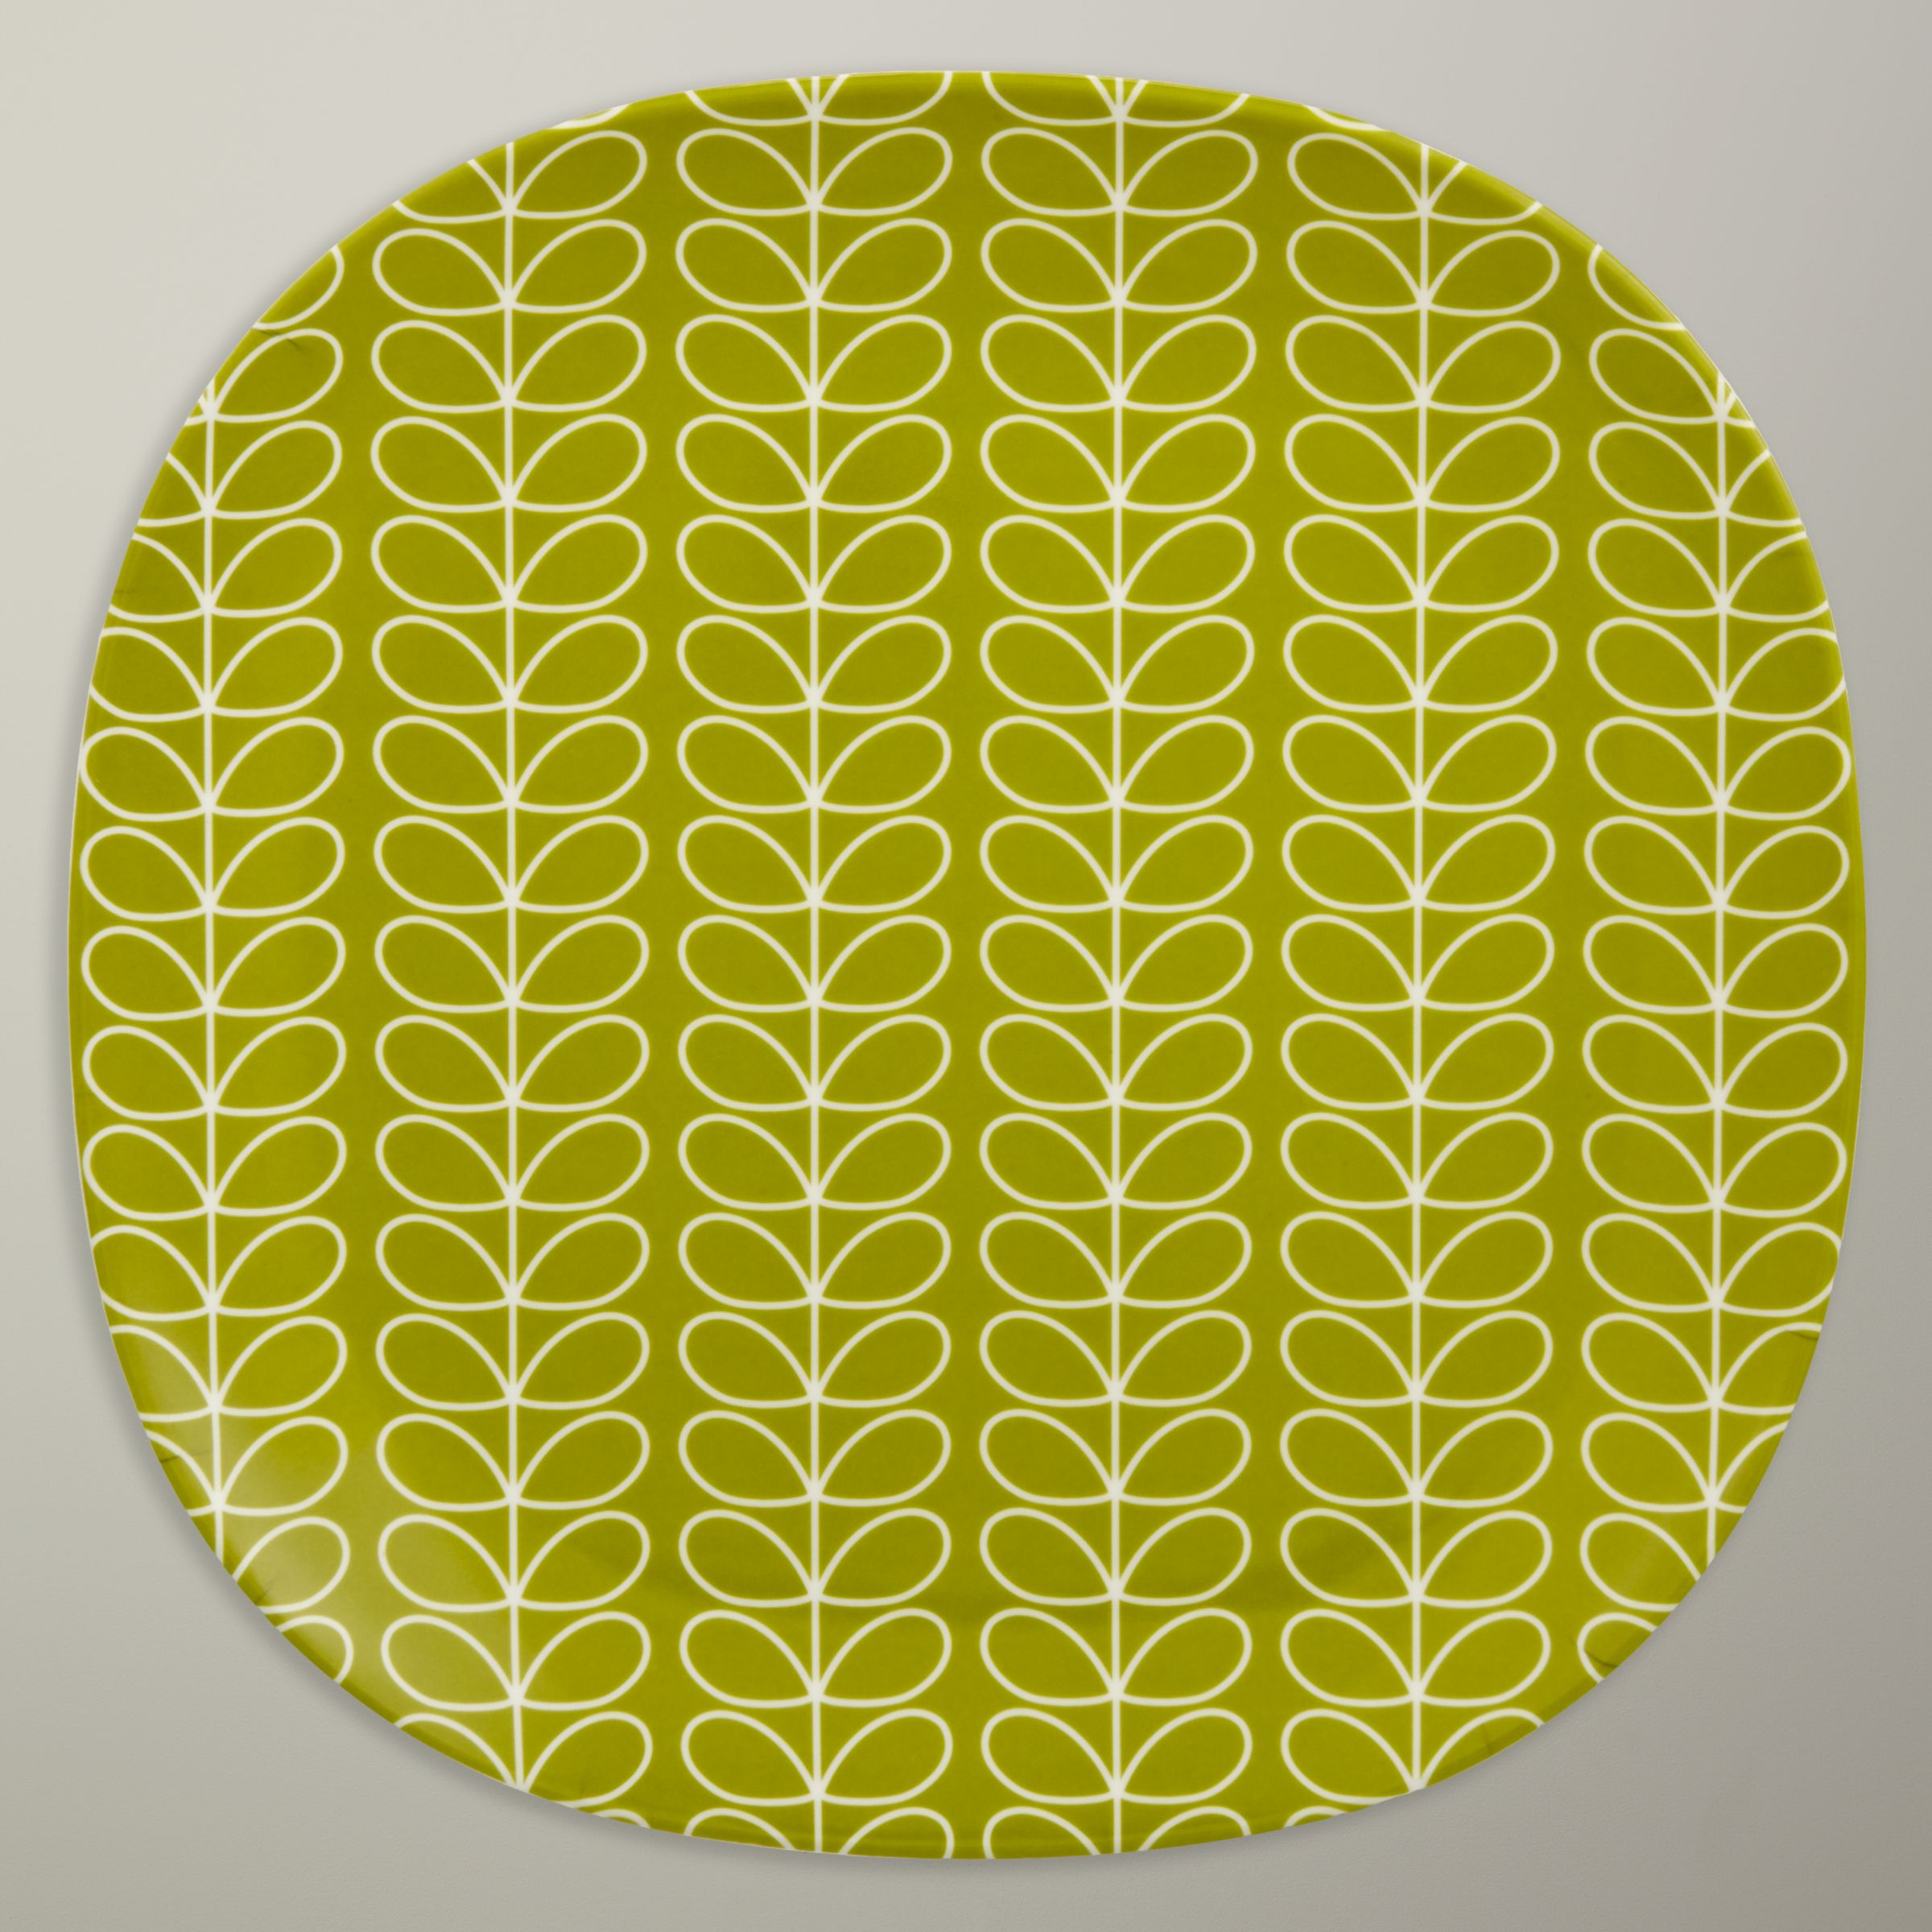 Orla Kiely Linear Stem Melamine Side Plate, Candy Floss